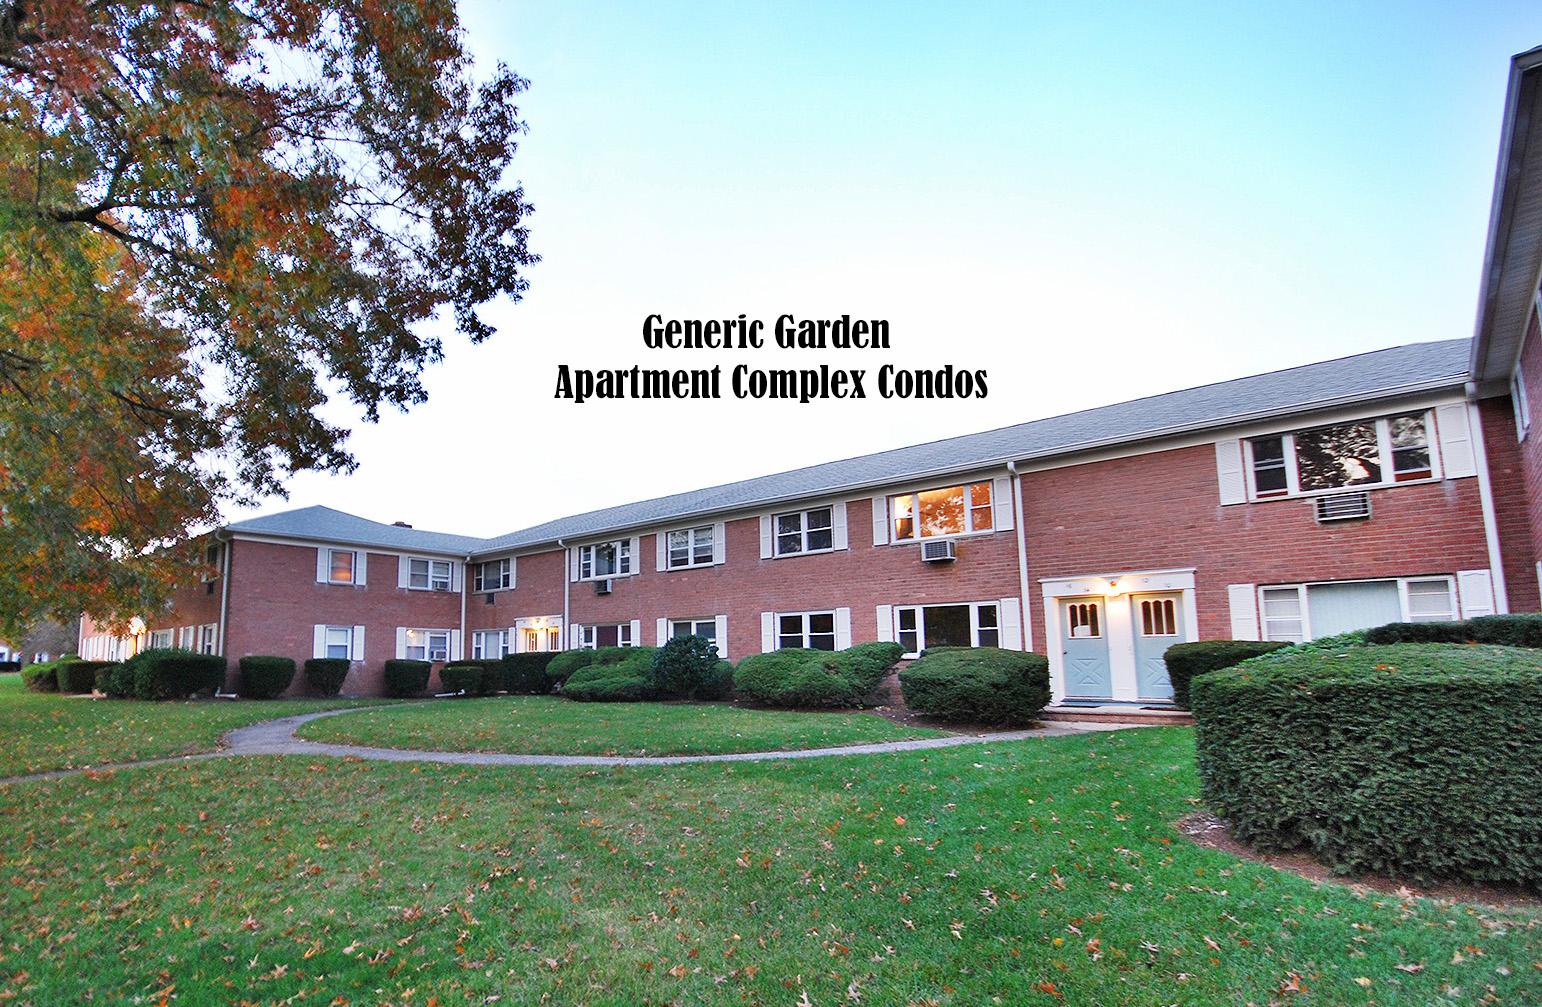 4.78/5 (12) Sunny Gardens Condos Pompton Lakes New Jersey